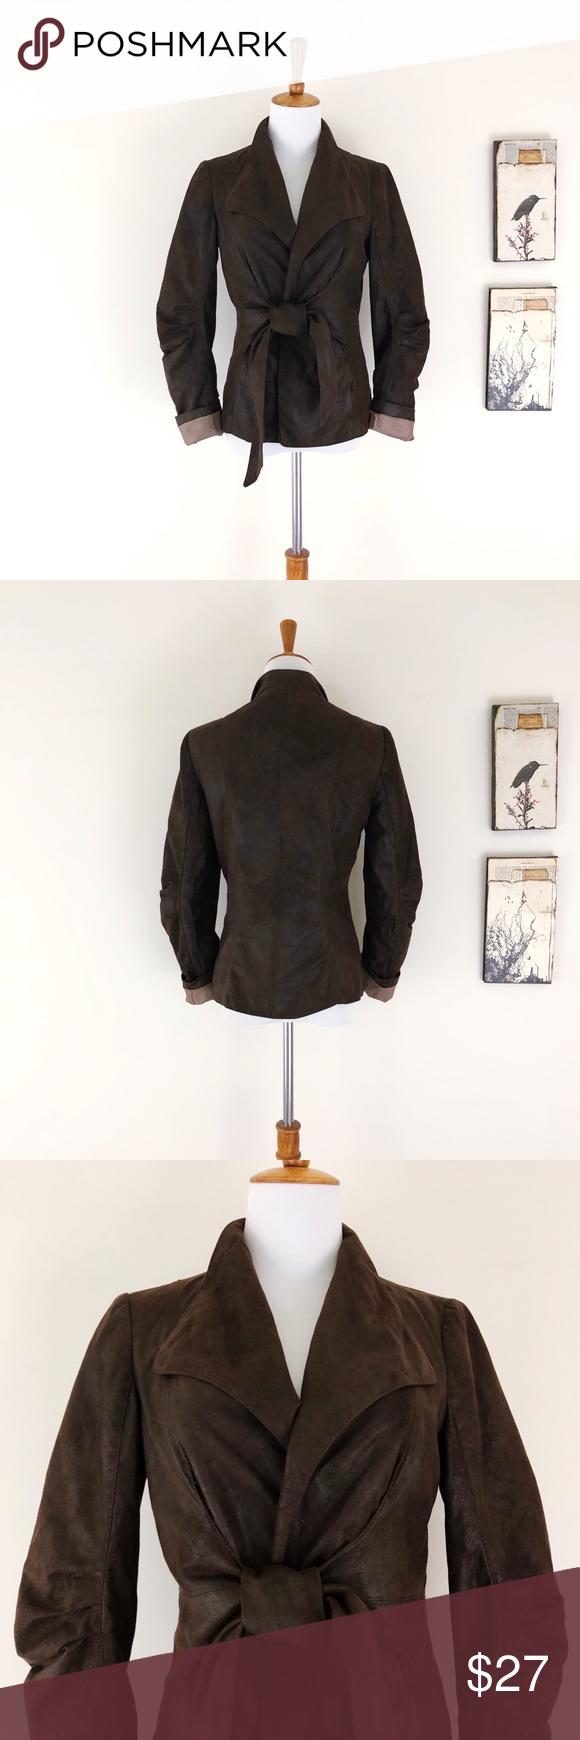 ZARA Brown Faux Suede Tie Front Open Jacket S Clothes